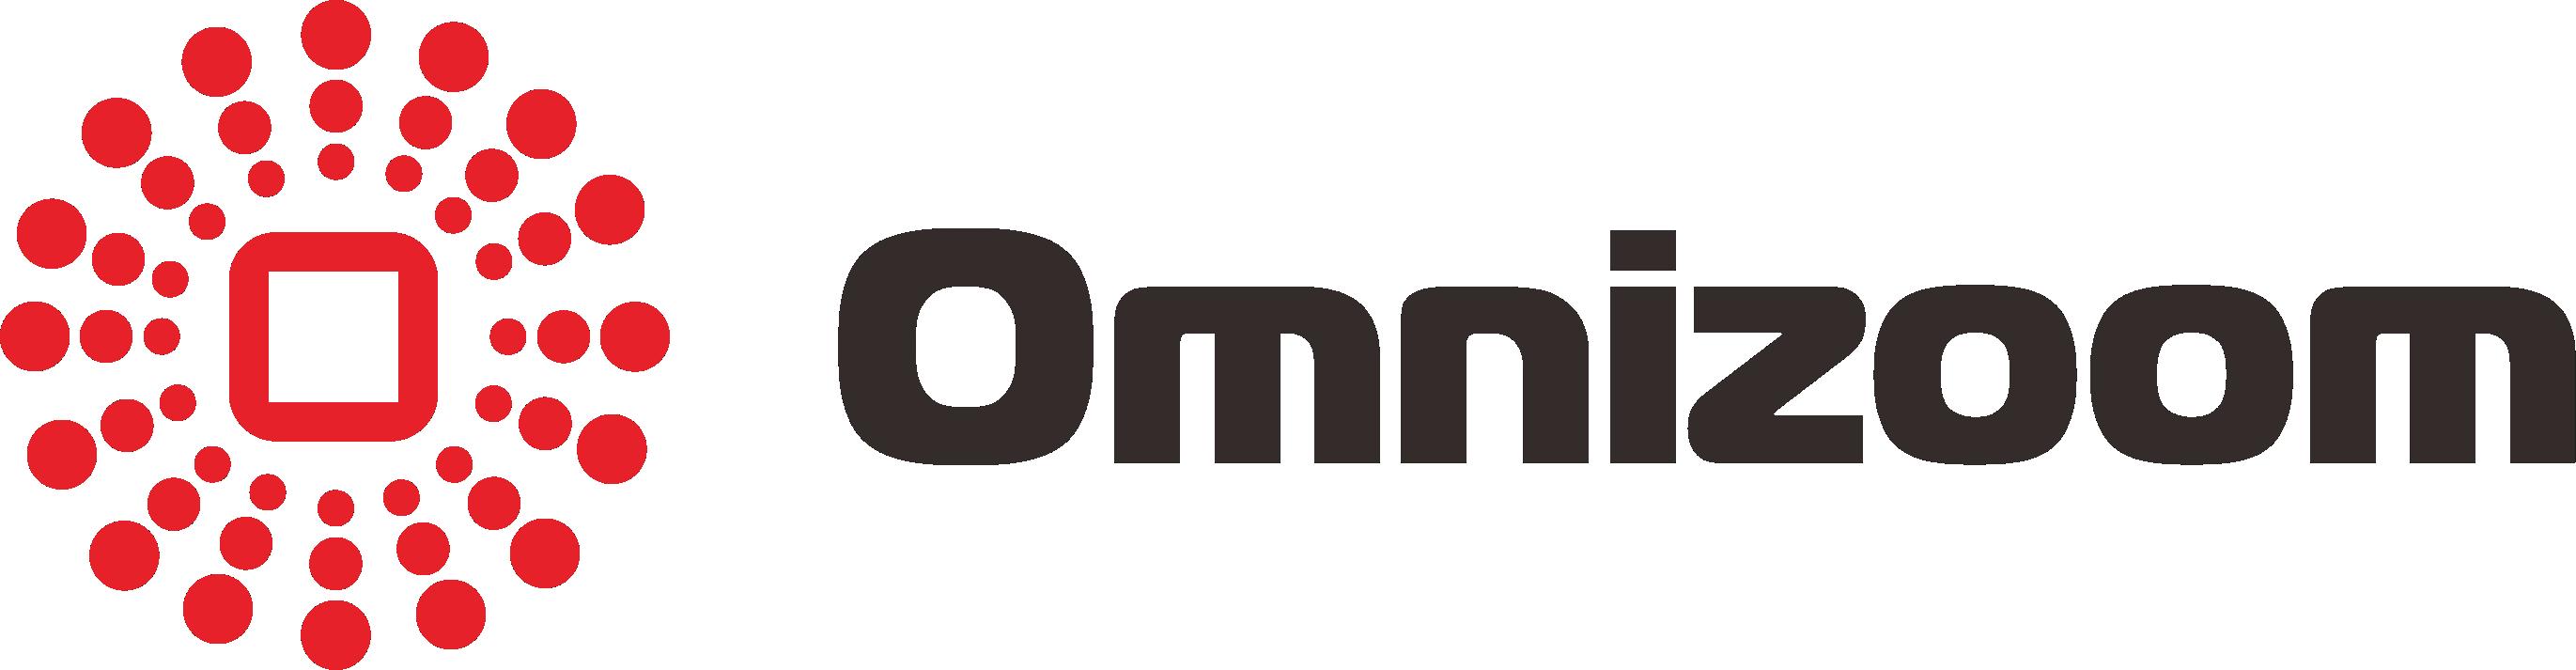 OmniZoom Studio-Display Lights,Exhibit Lights,LED lighting solutions.